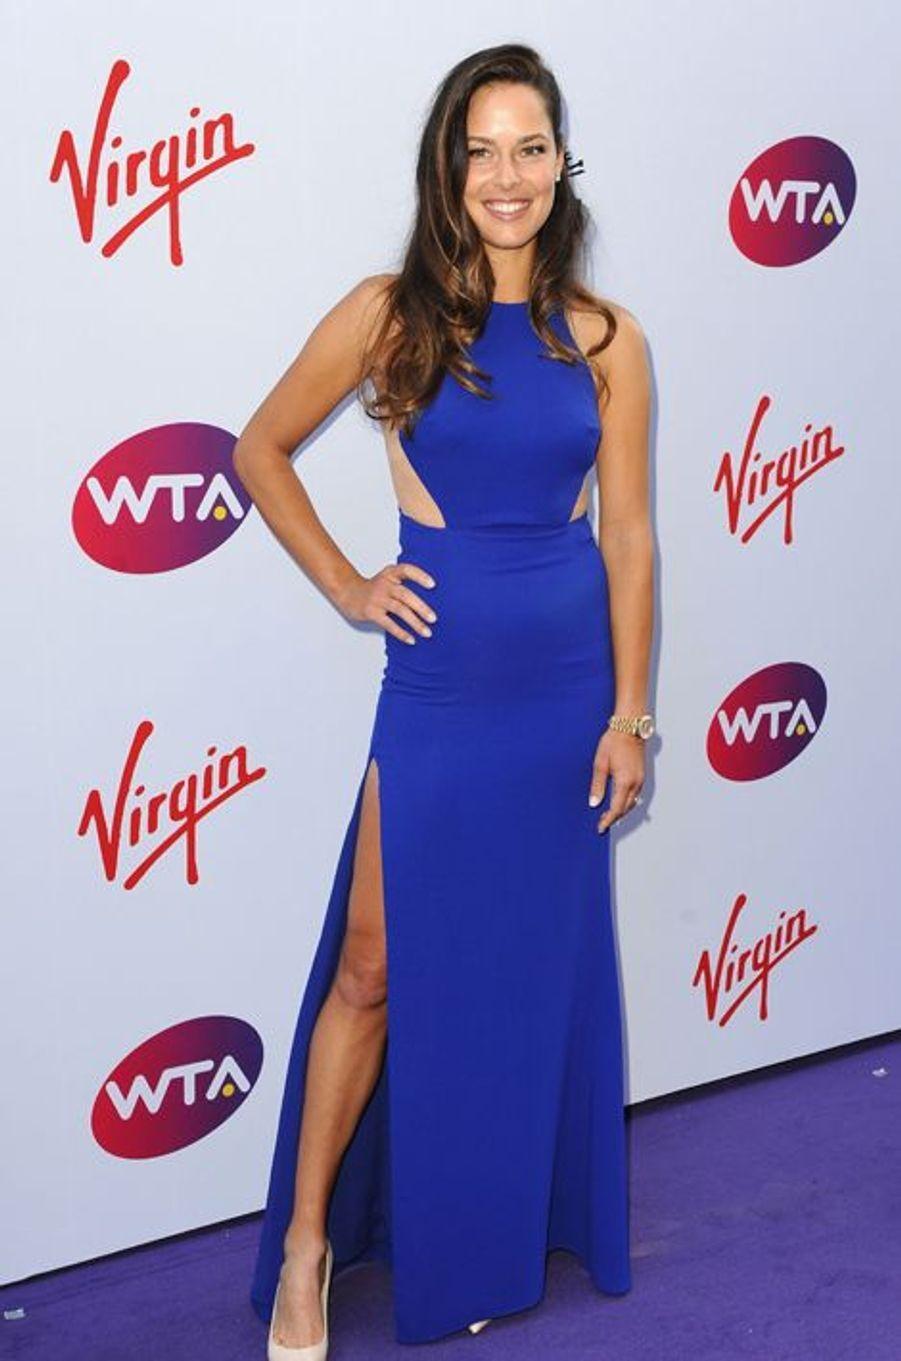 La joueuse serbe Ana Ivanović